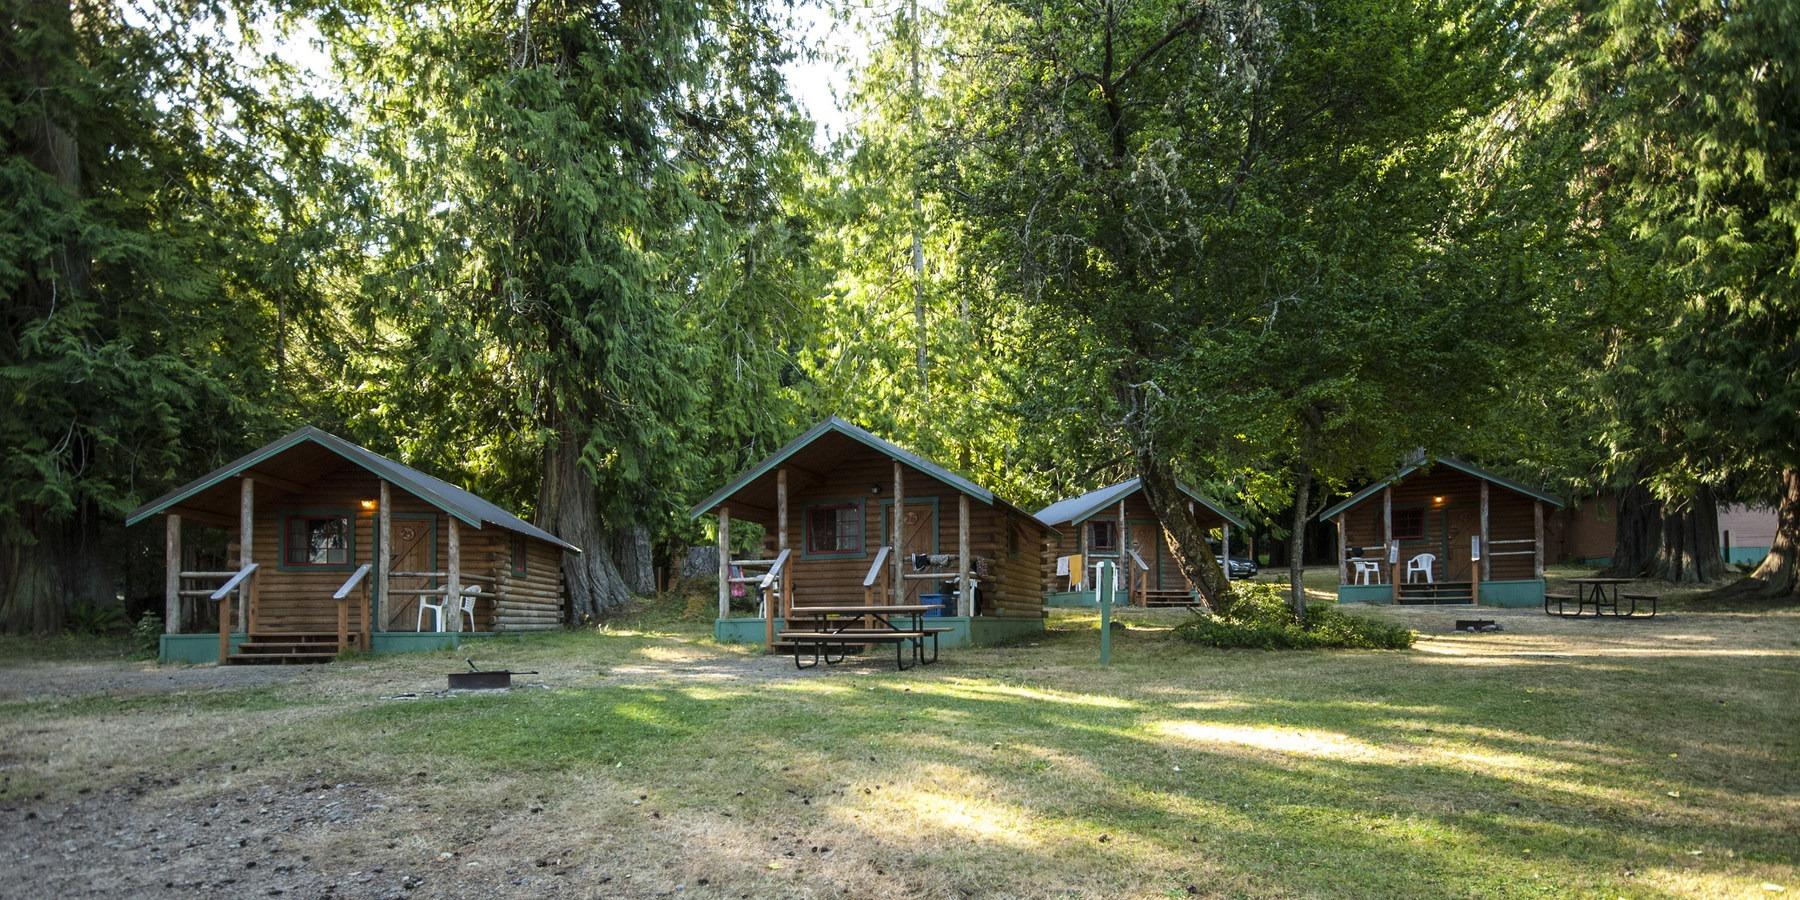 Log cabin resort outdoor project for Log cabin resorts